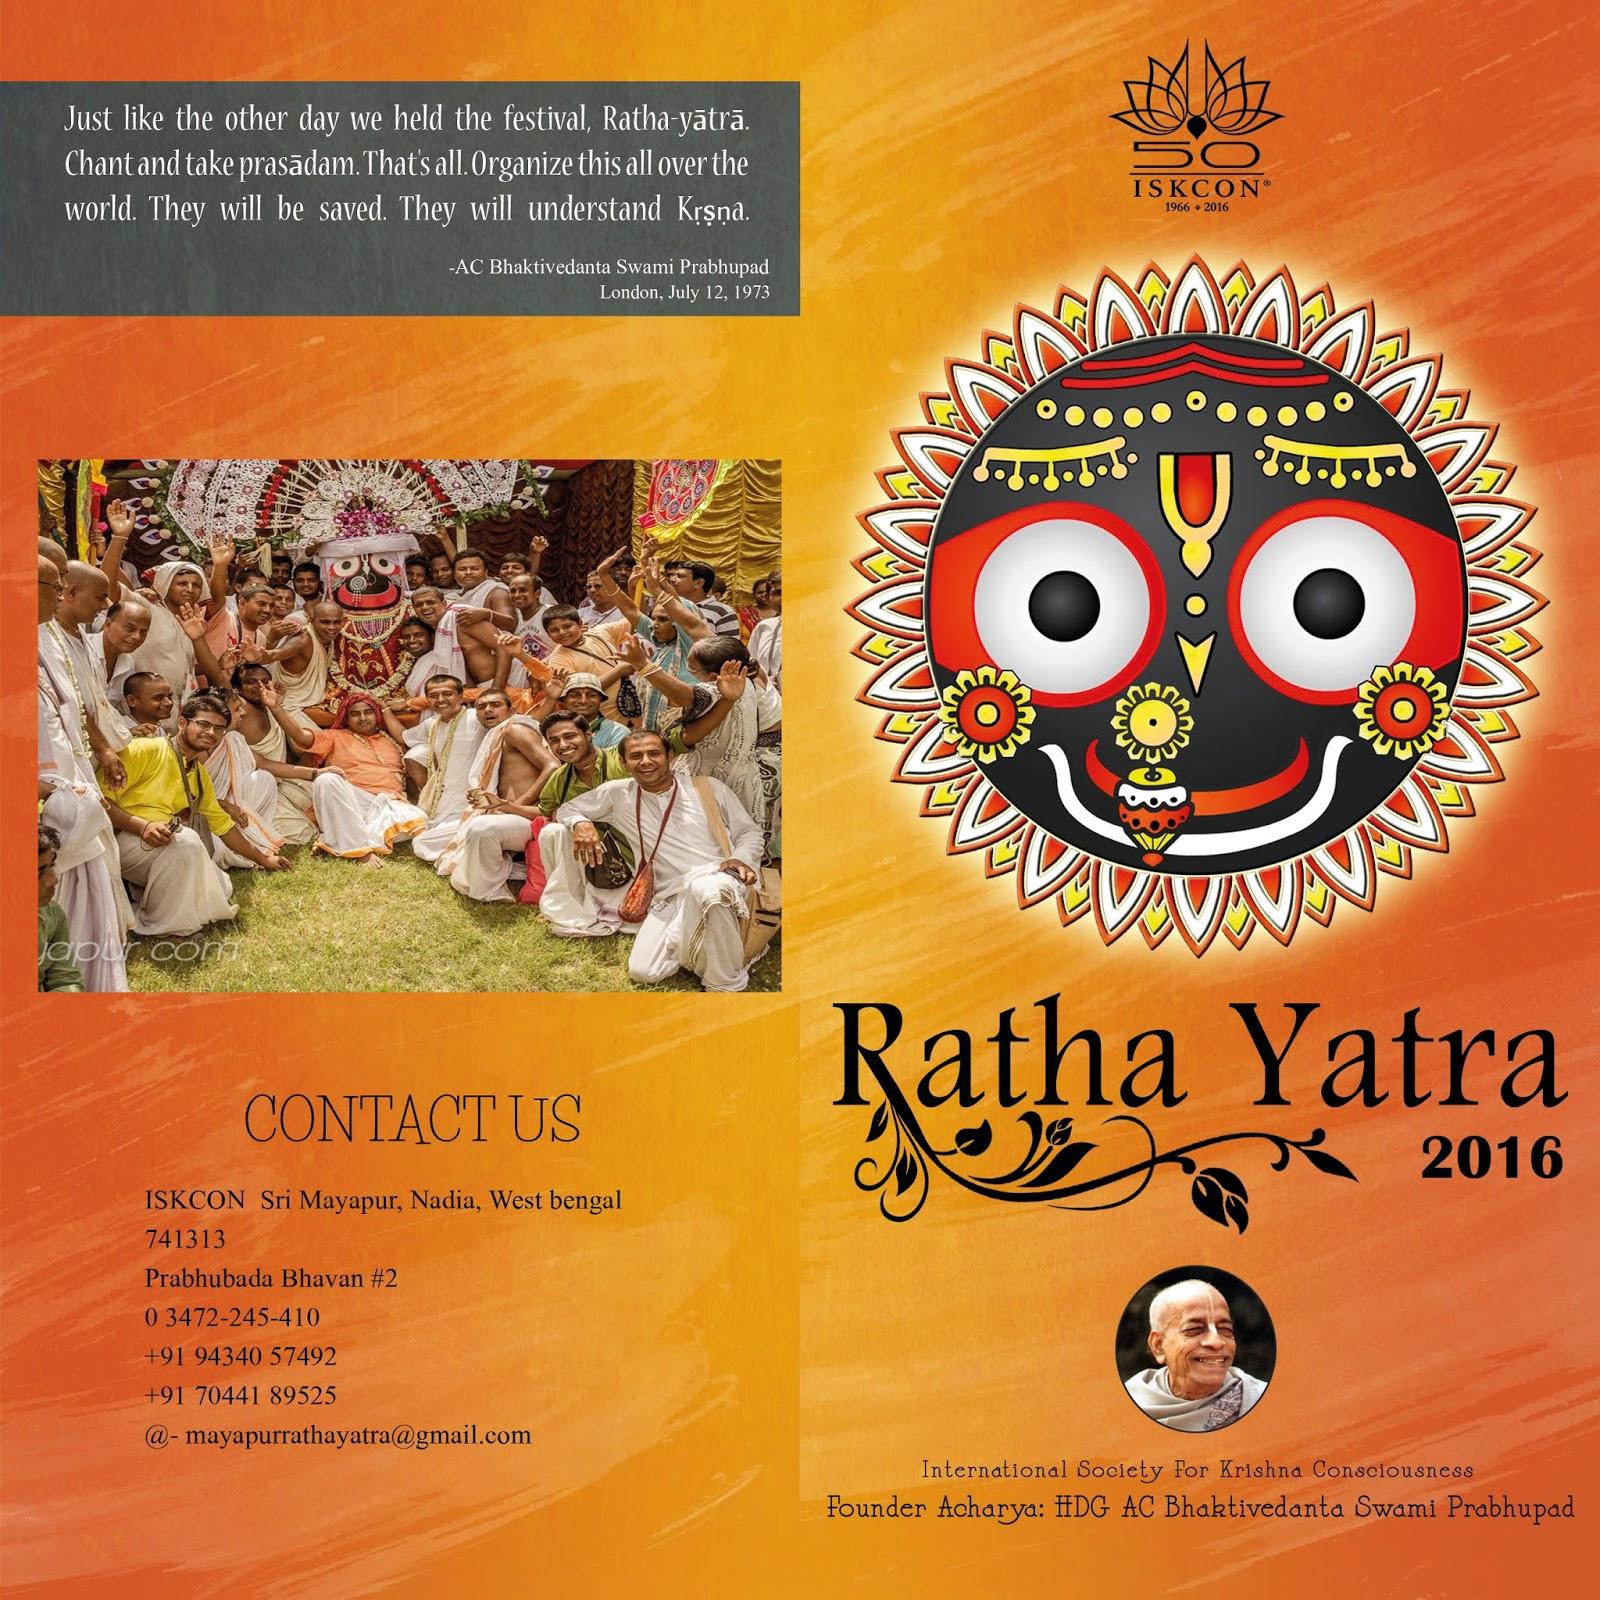 golden avatar: Sri Jagannath Ratha Yatra Invitation 2016 (ISKCON